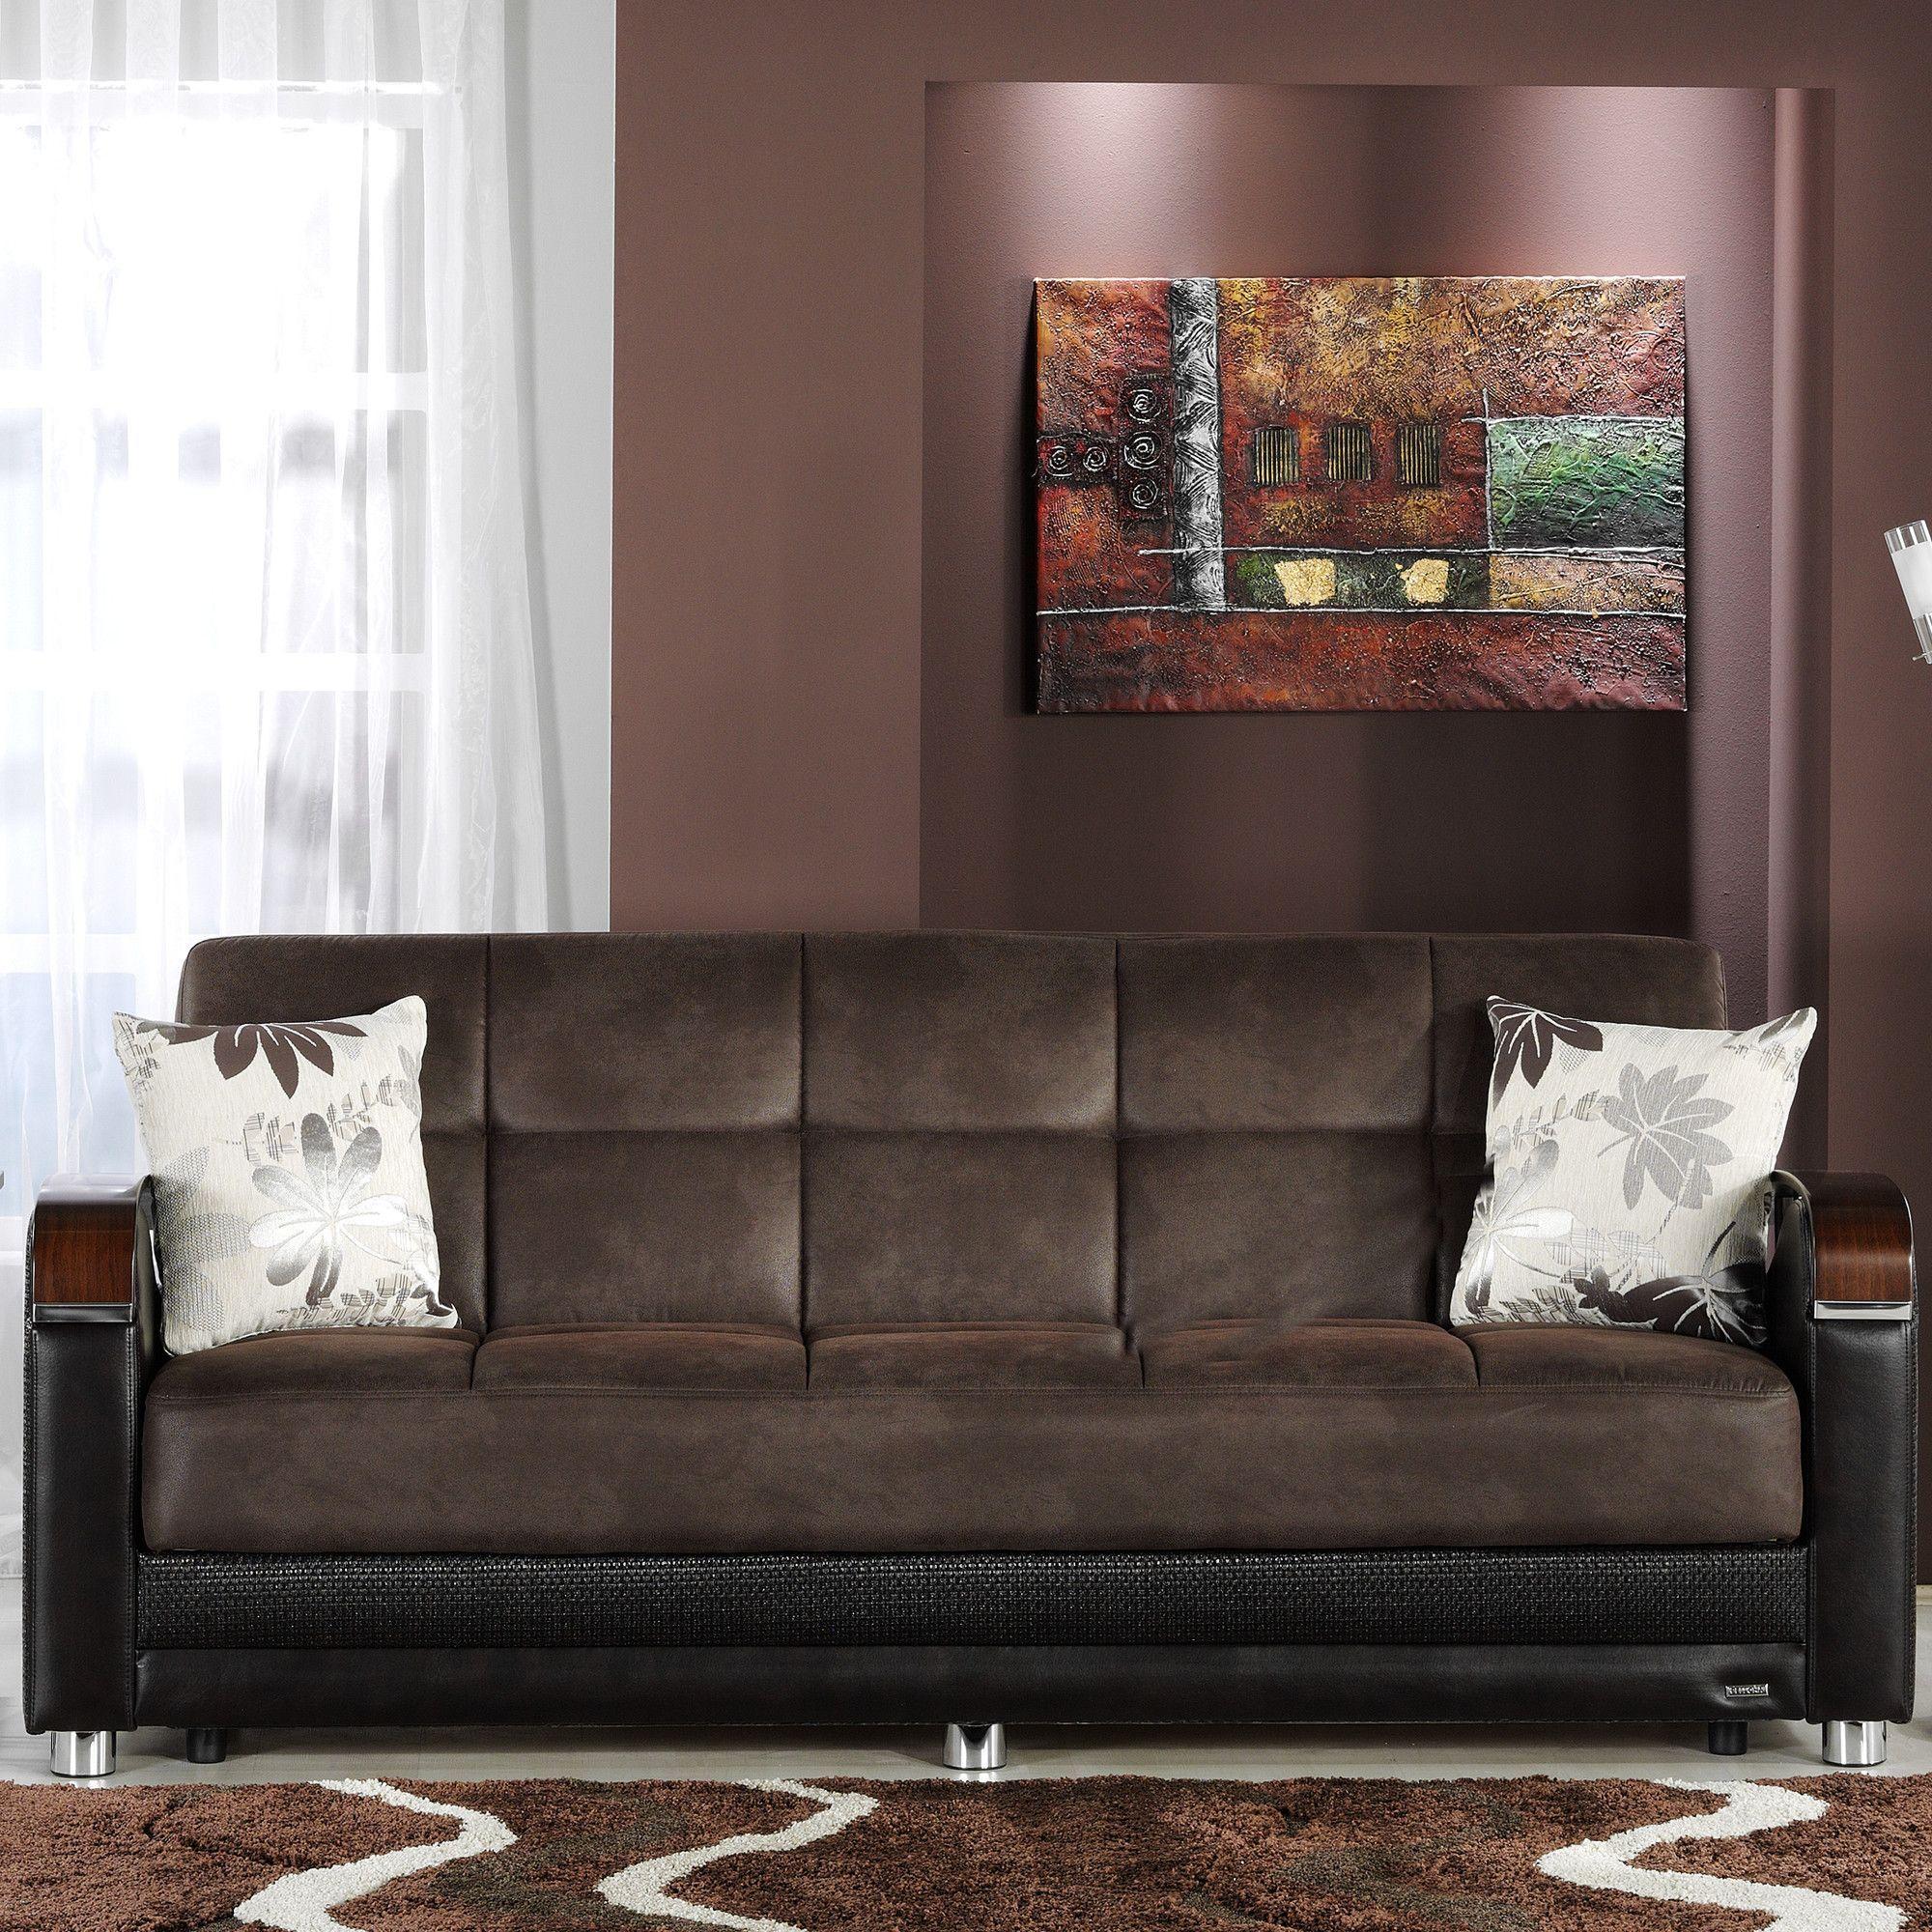 3 Sitzer Baracca 220x95 Braun Antik Optik Bauhausstil Sofa